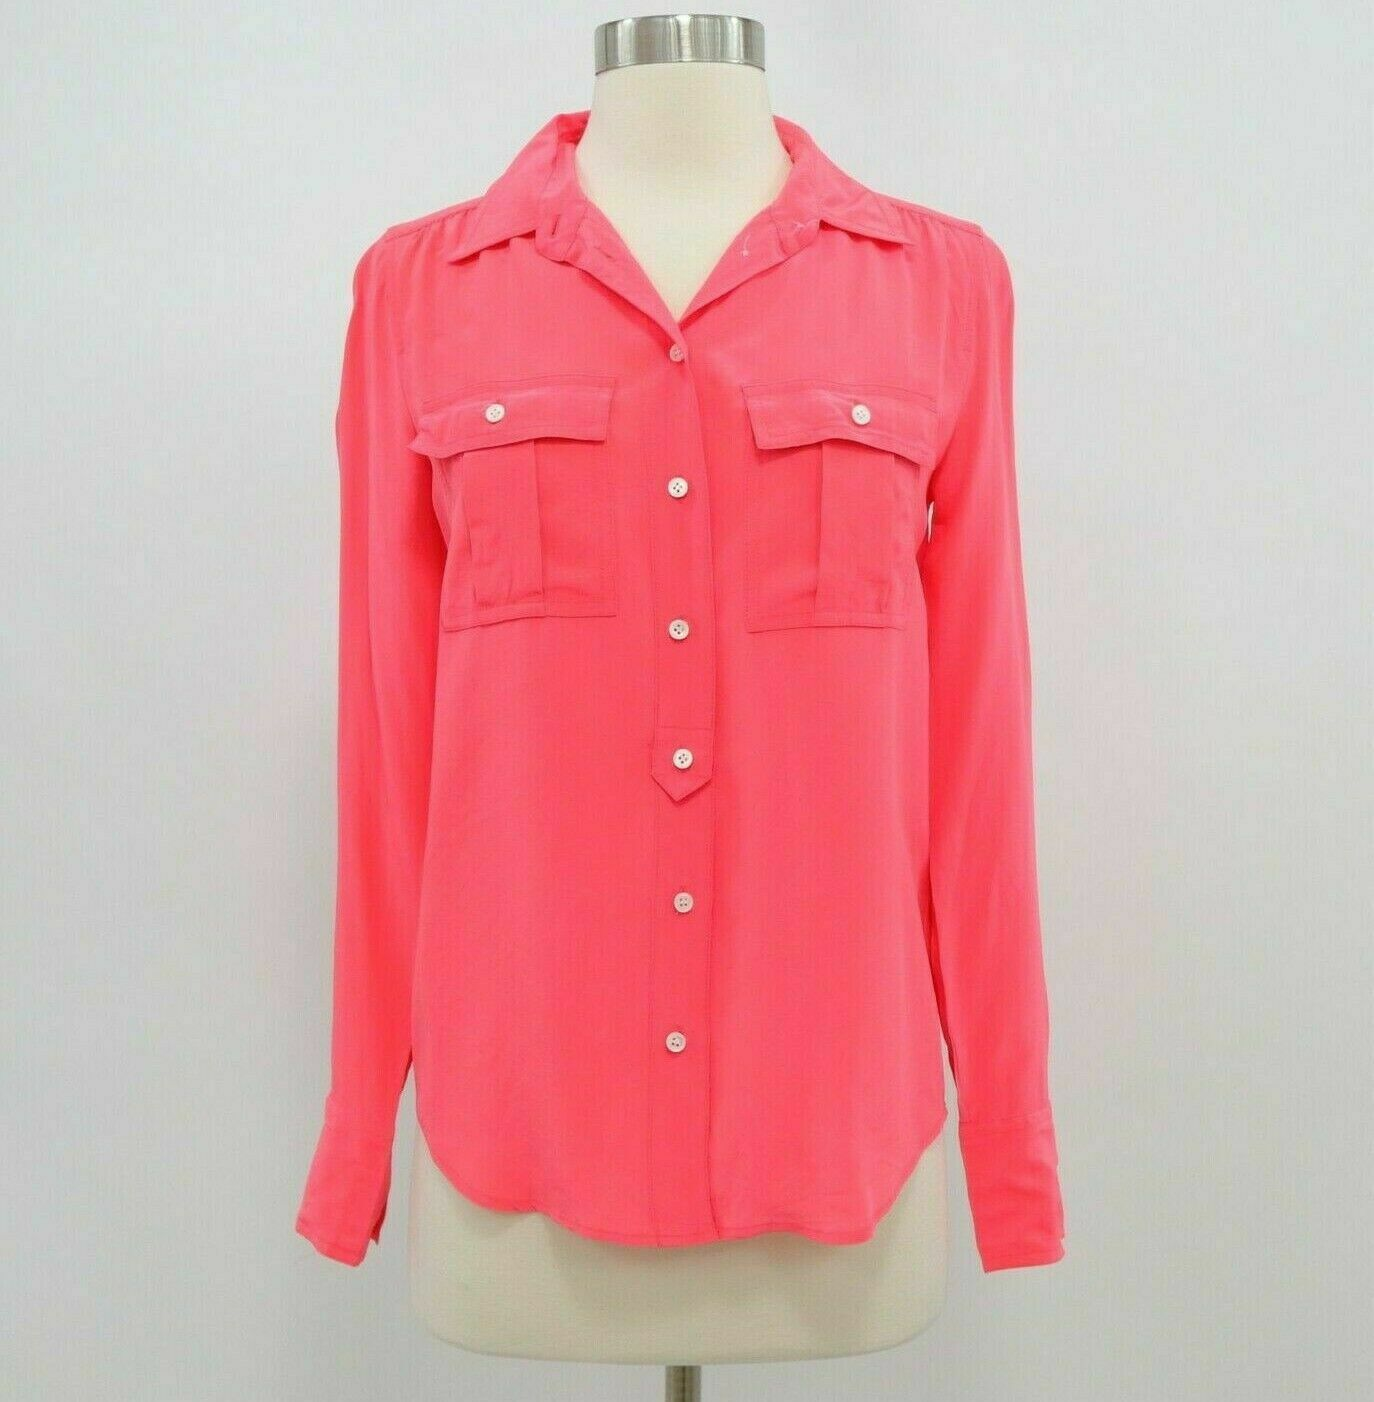 J.CREW Blouse Shirt Top Womens 100% Silk Blythe Sz 0 Neon Coral Red